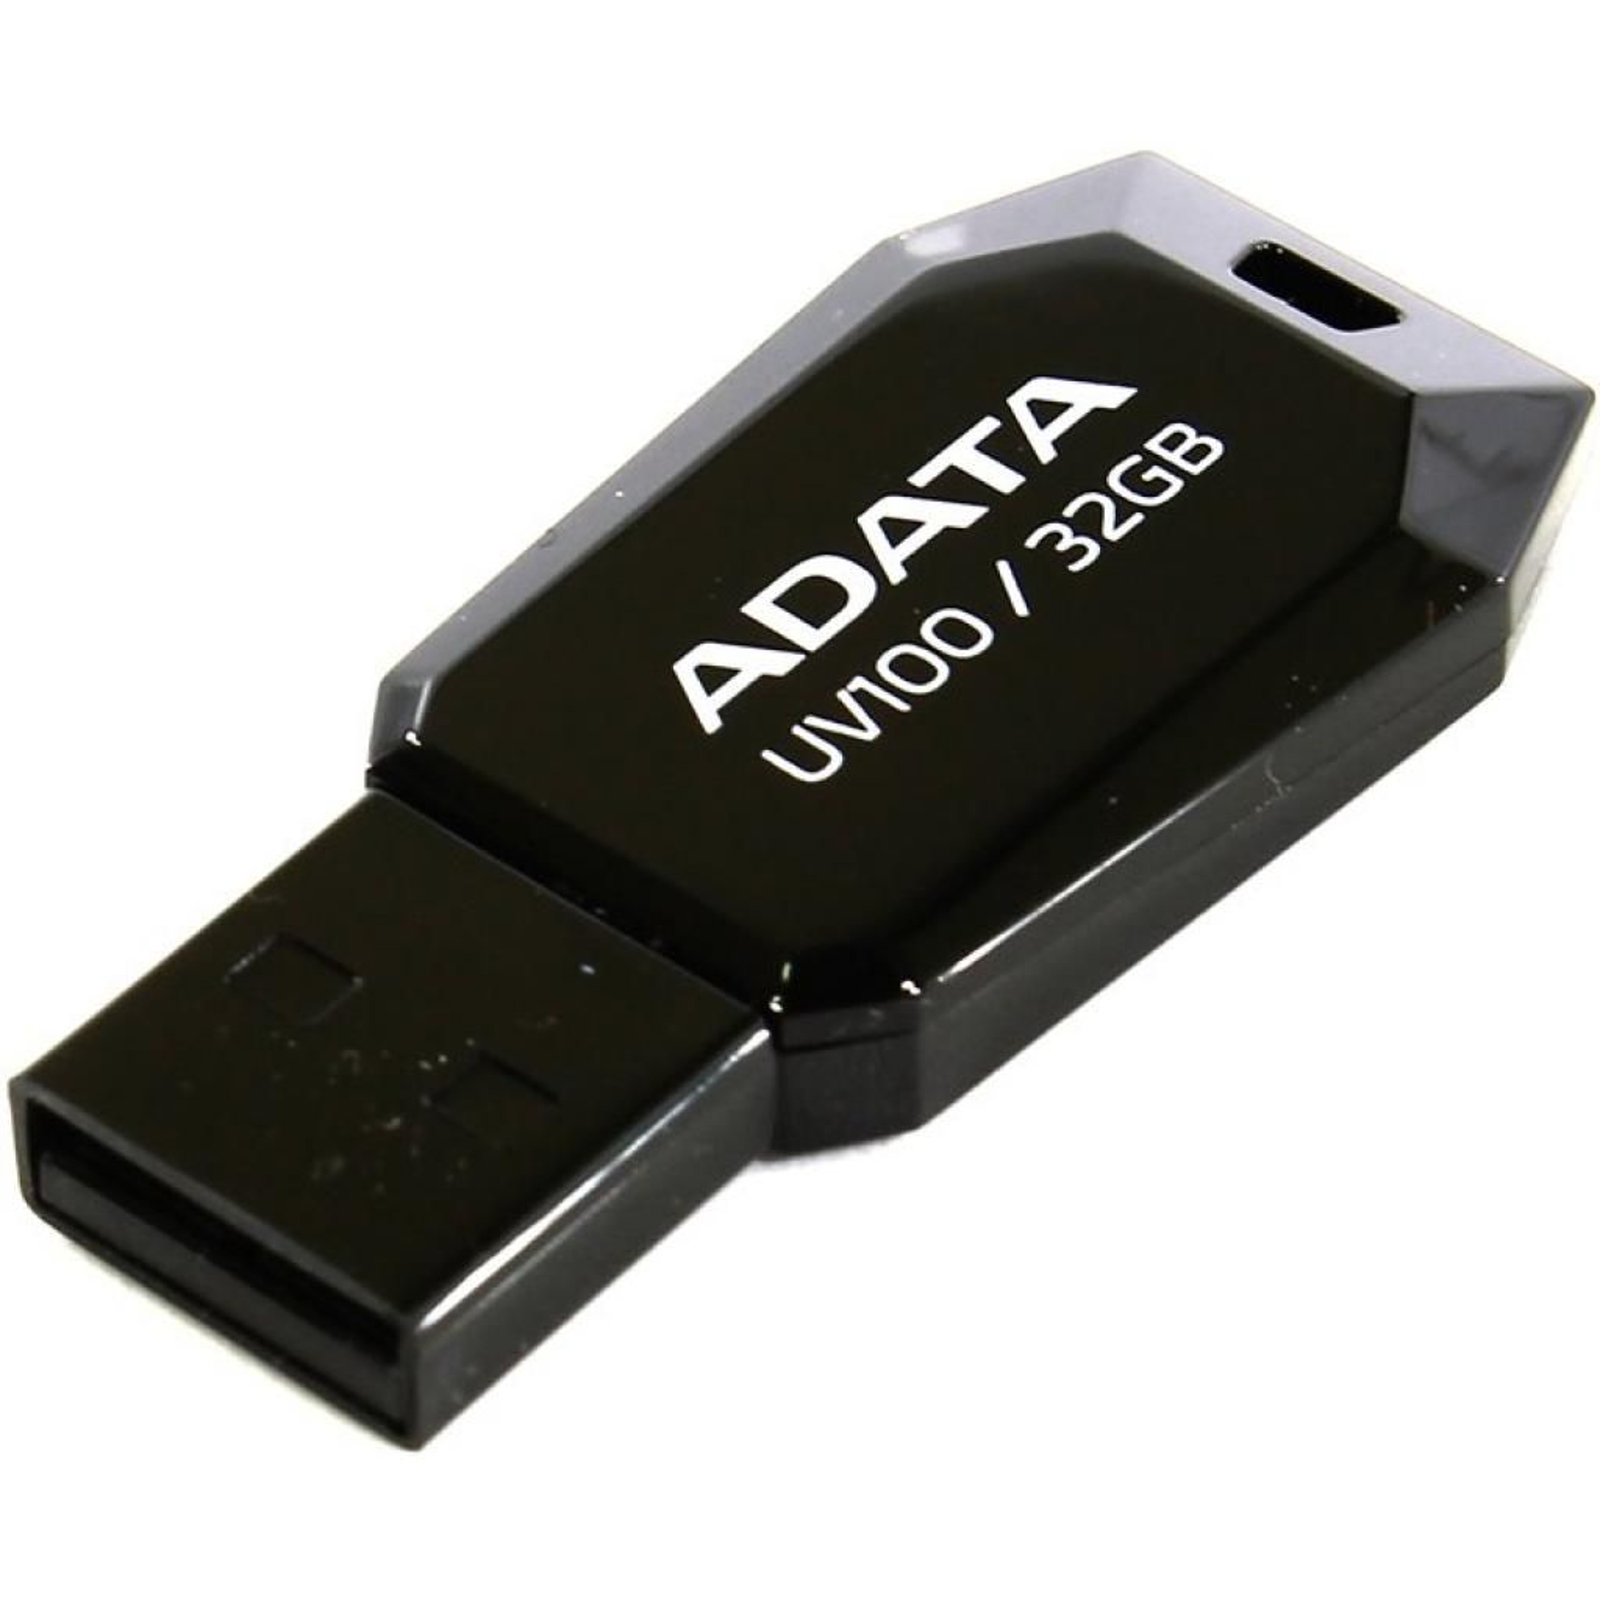 USB флеш накопитель ADATA 32GB DashDrive UV100 Blue USB 2.0 (AUV100-32G-RBL) изображение 2